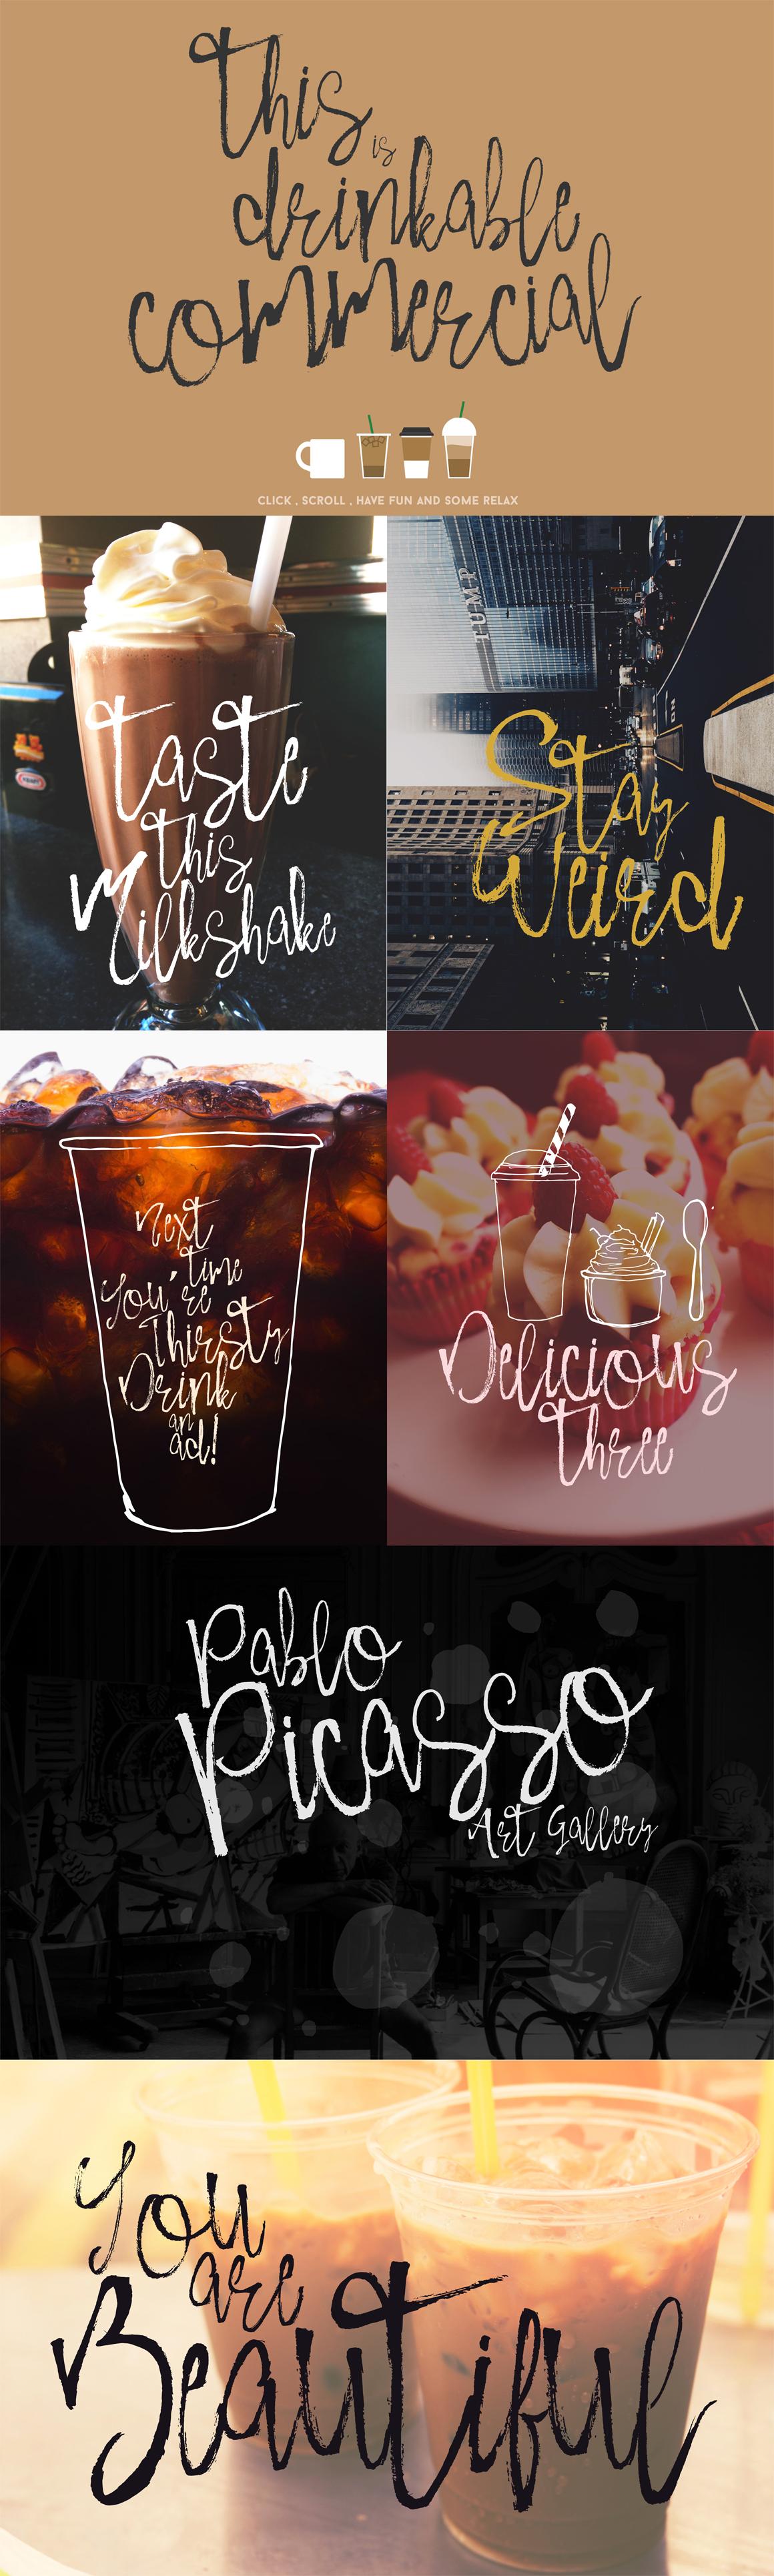 Milkshake and Extras example image 5